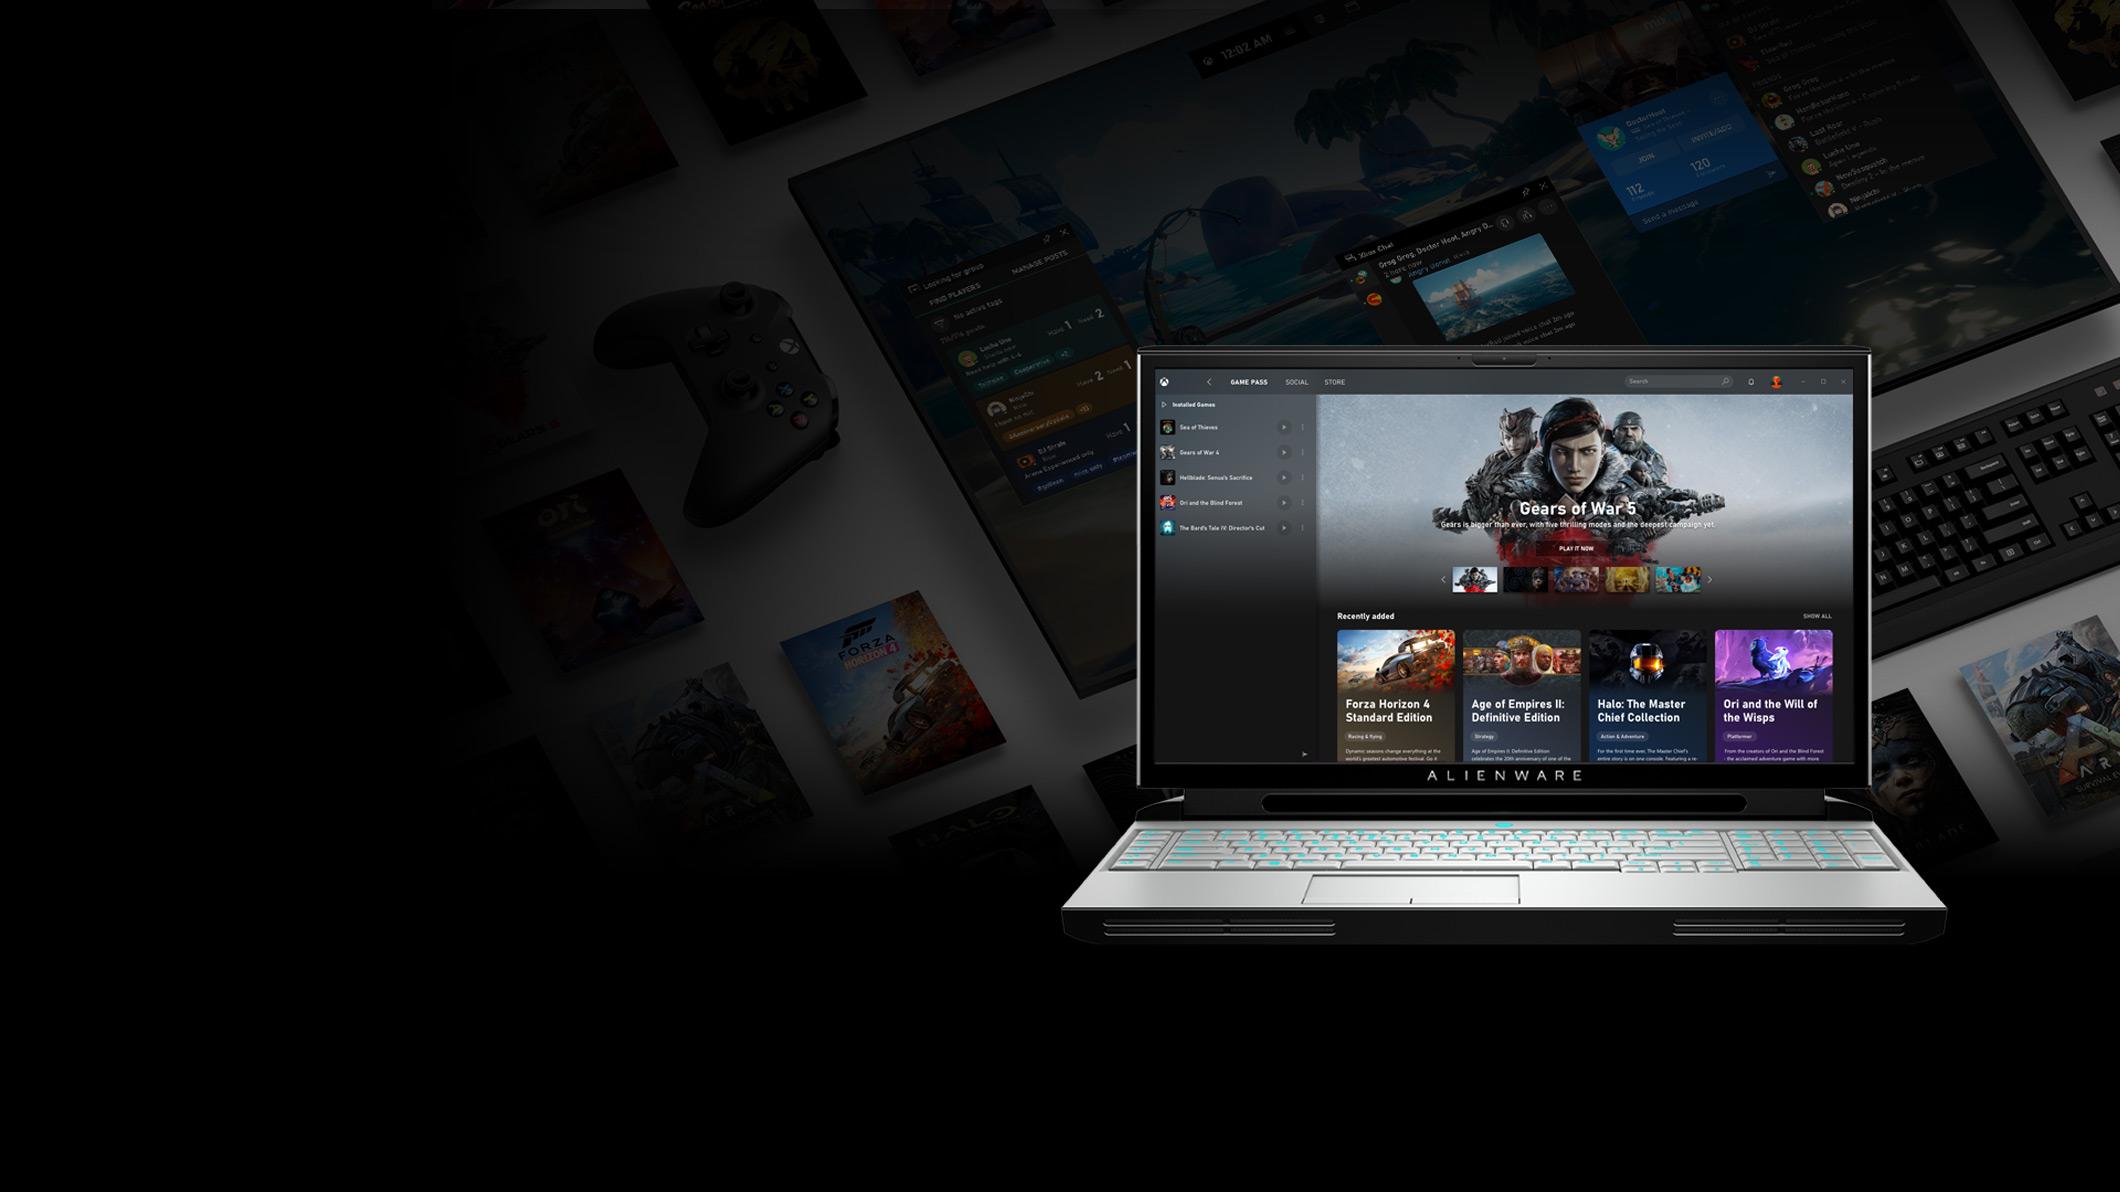 Windows 10 Pc Gaming Laptops Microsoft